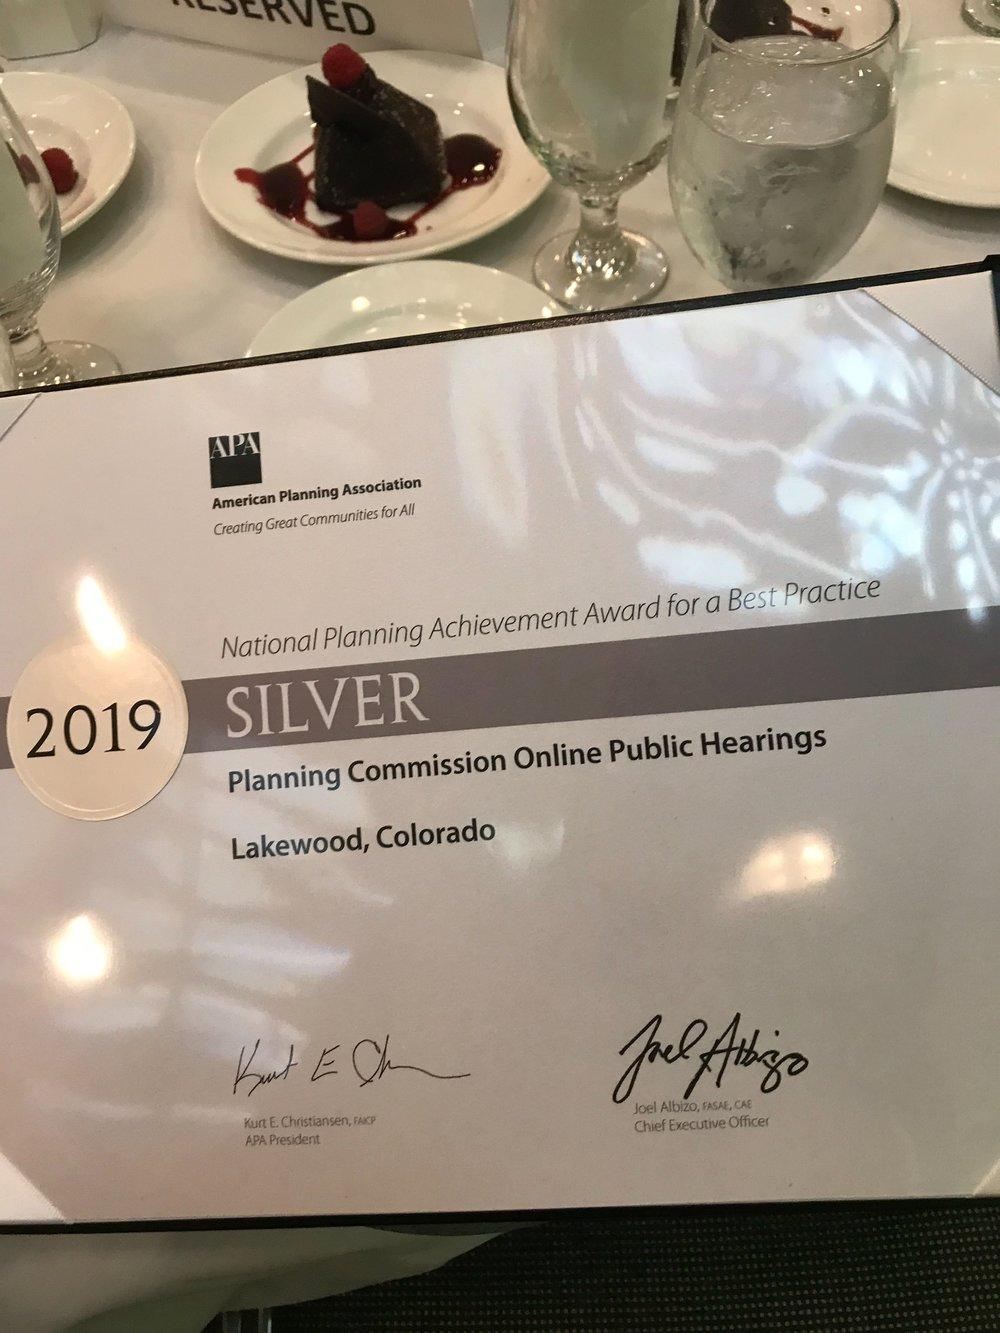 american-planning-association-award-for-best-practice-2019.jpg